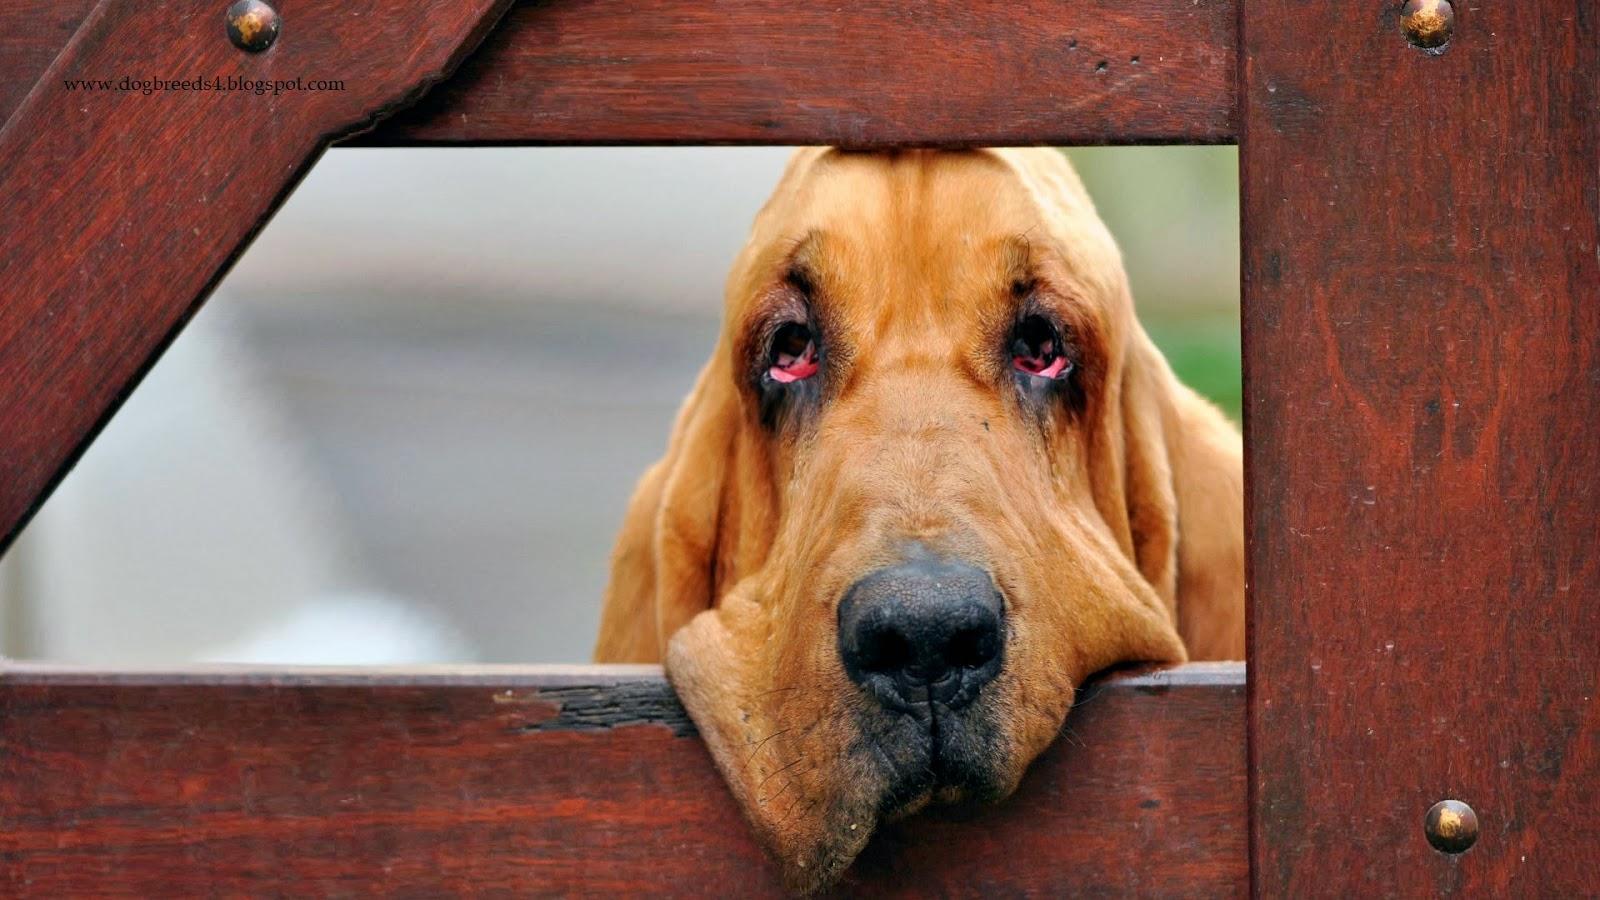 Cute Puppies Wallpaper Backgrounds Dogbreeds4 Blogspot Bloodhound